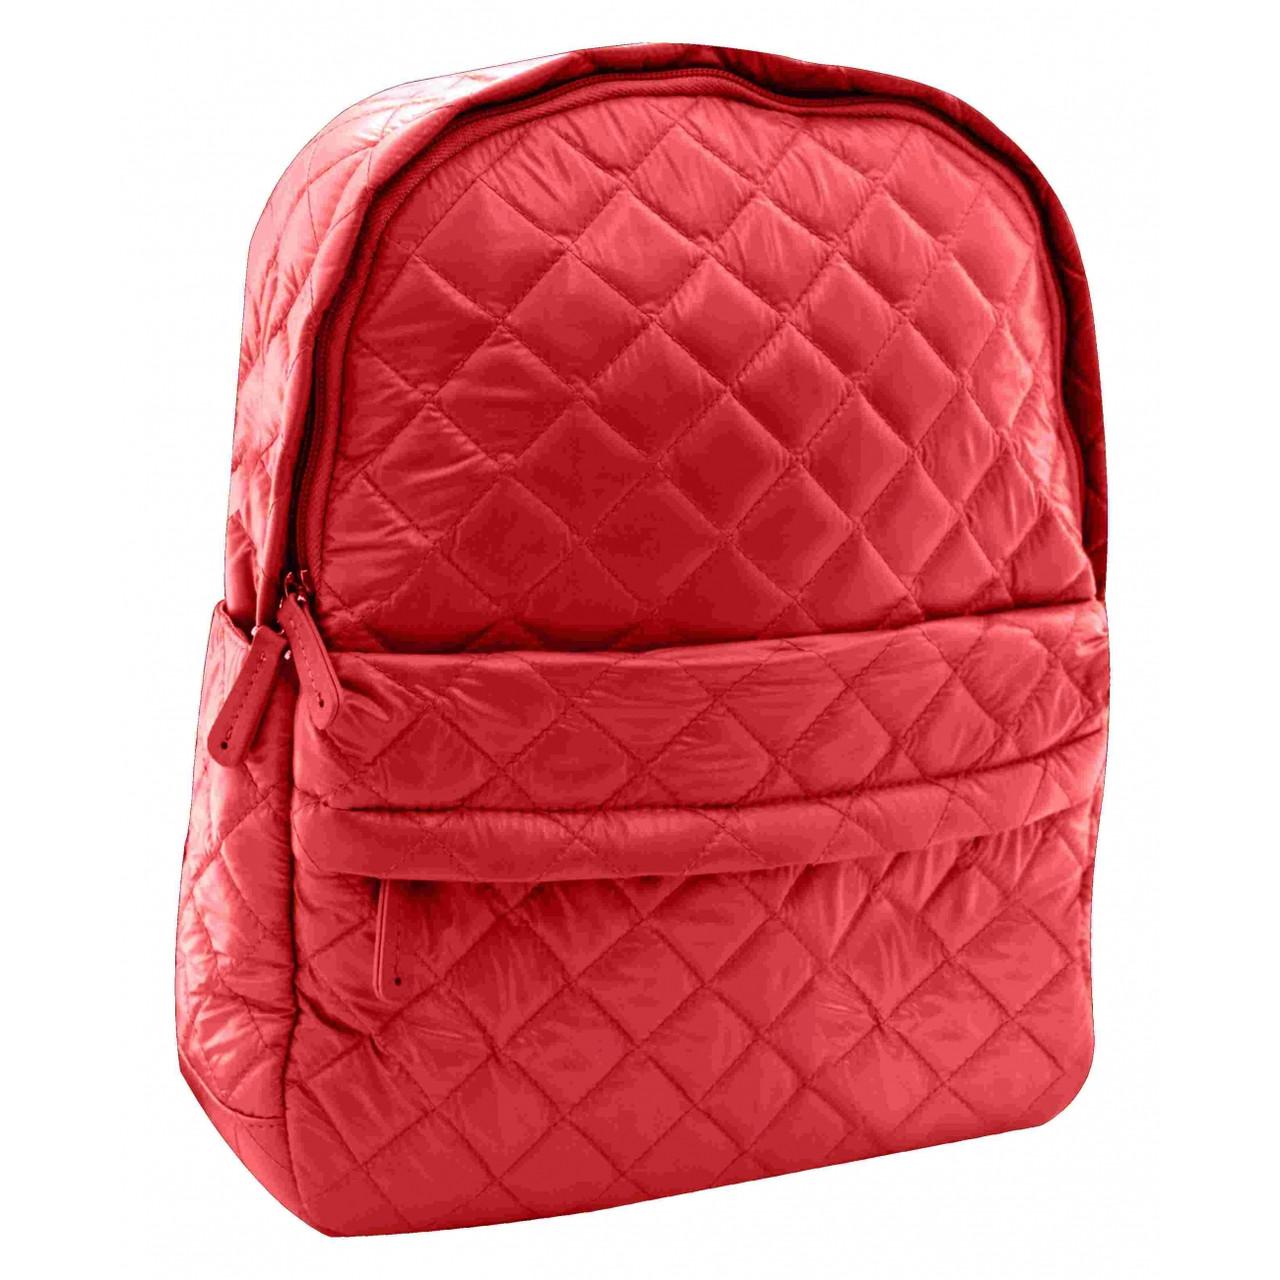 Рюкзак подростковый ST-14 Glam 12, 35*27*11